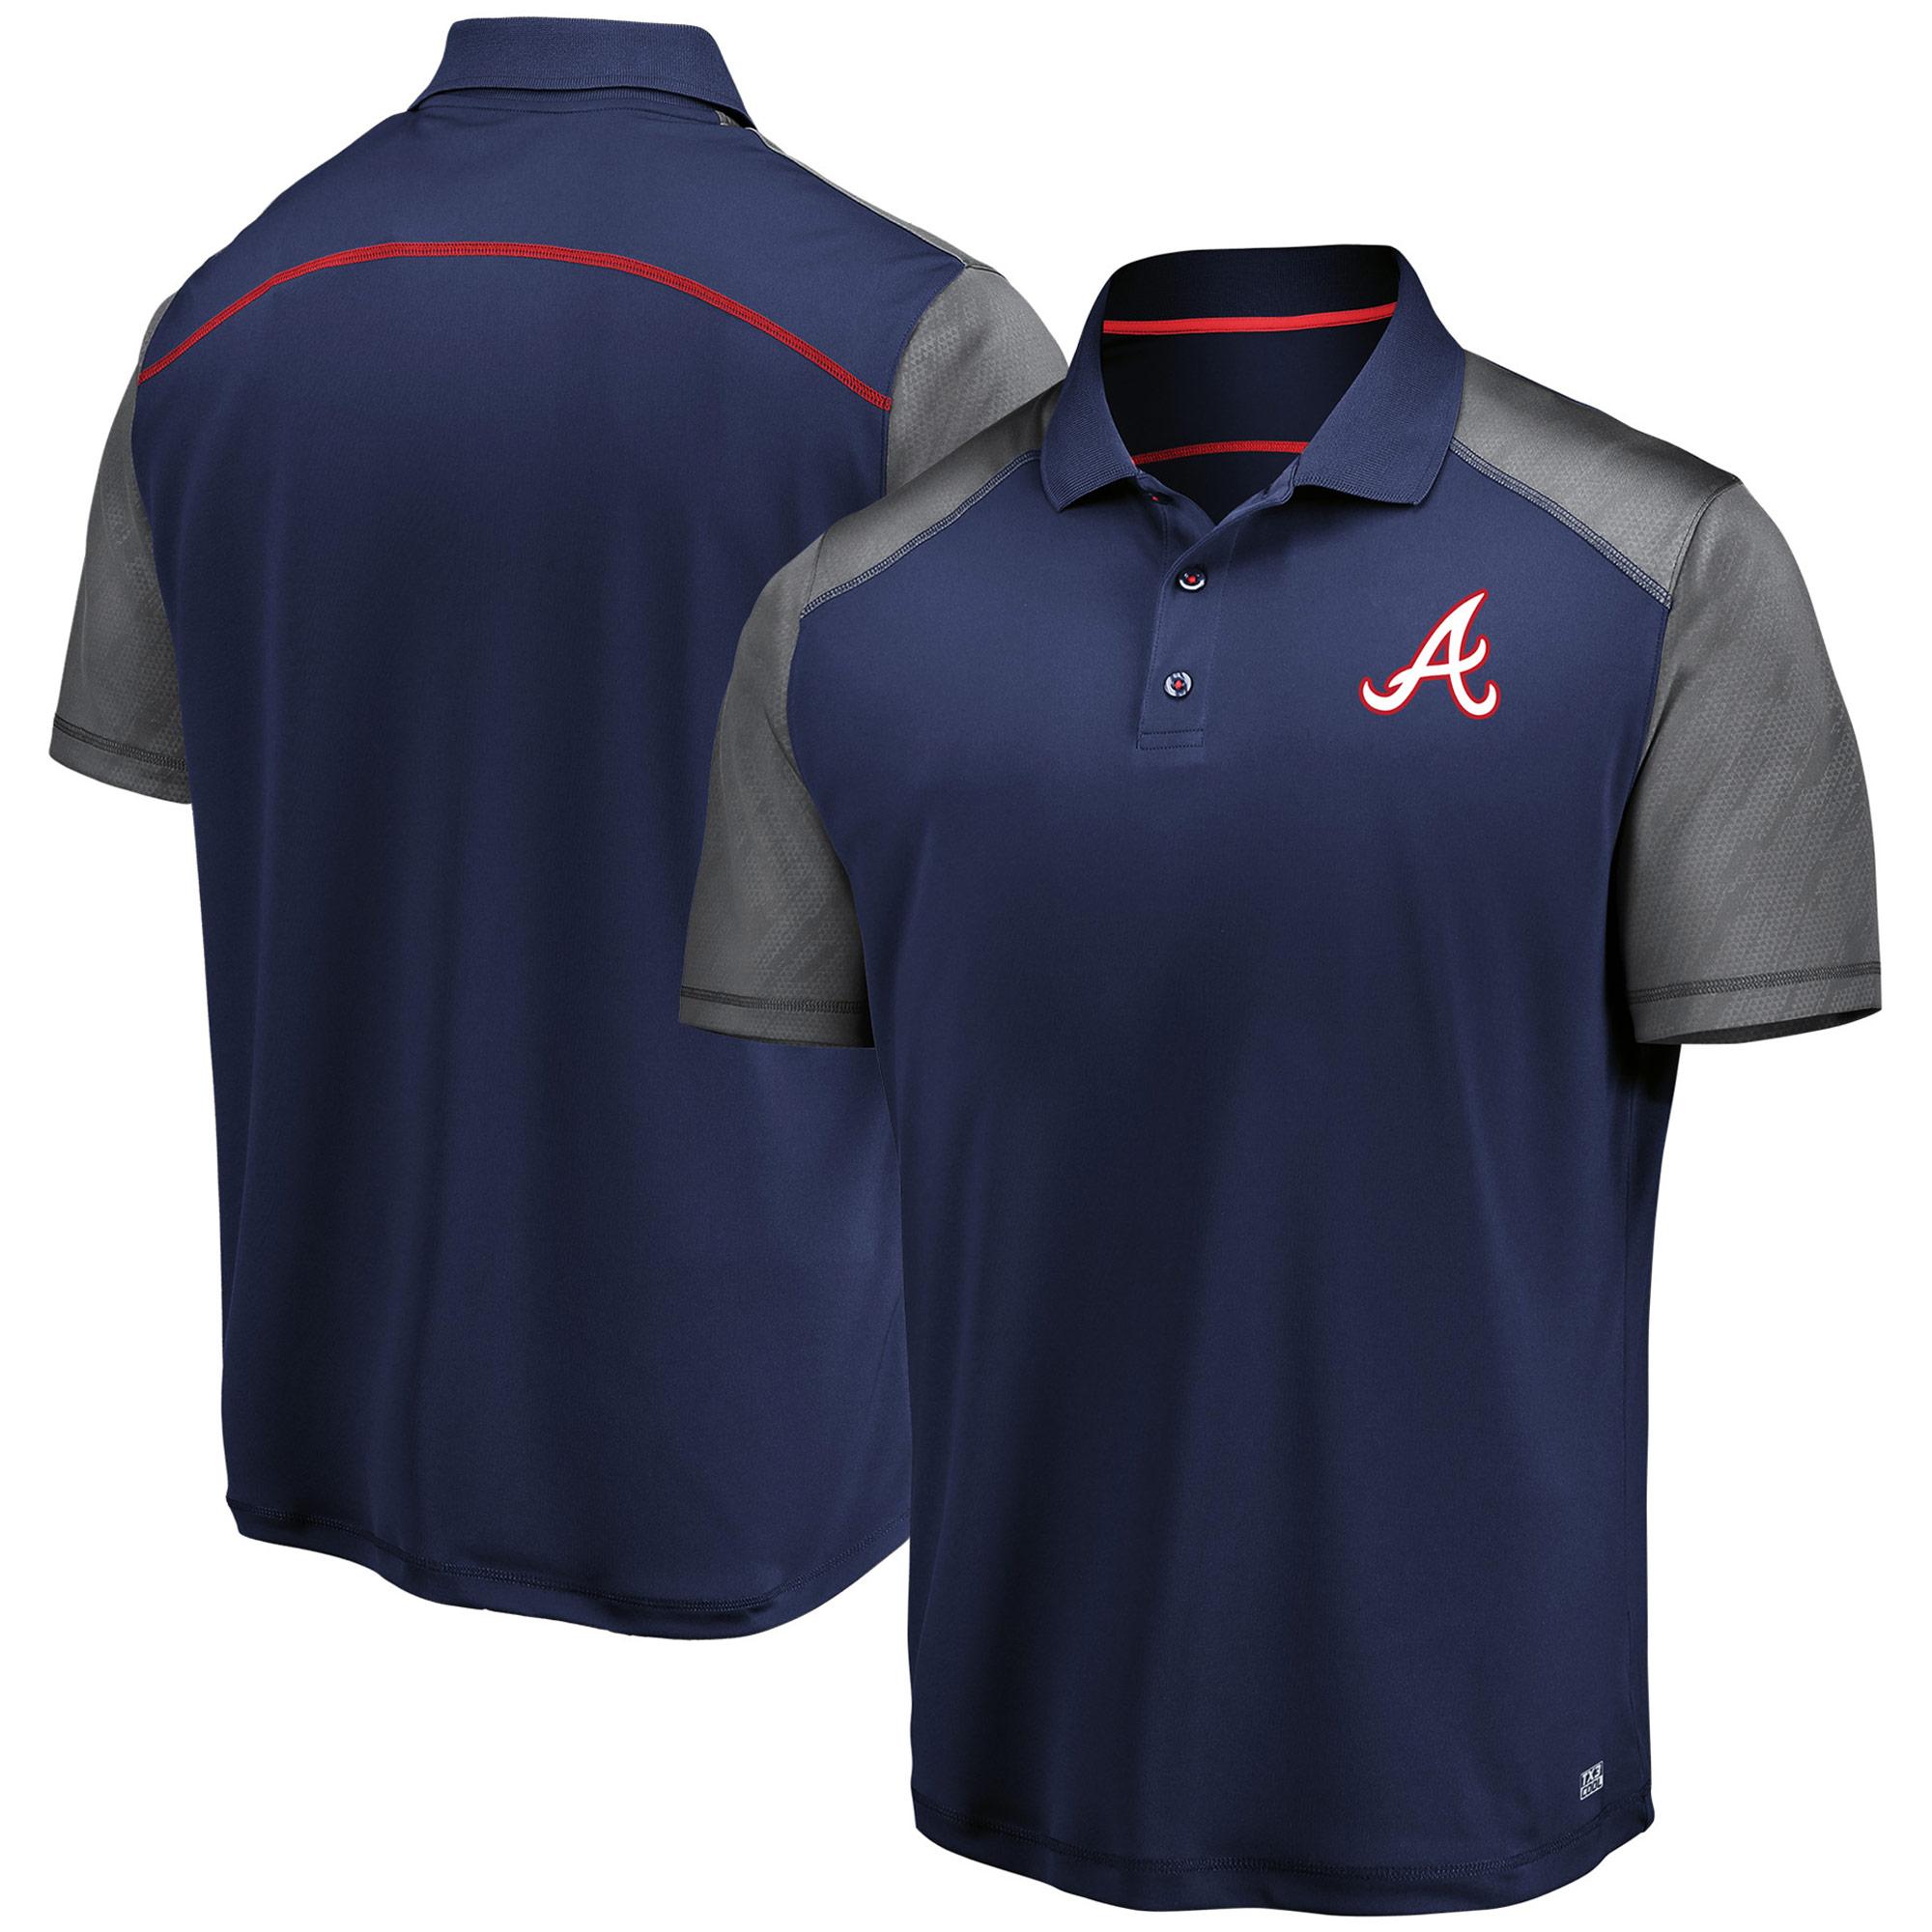 Men's Majestic Navy/Gray Atlanta Braves Cool Base Polo